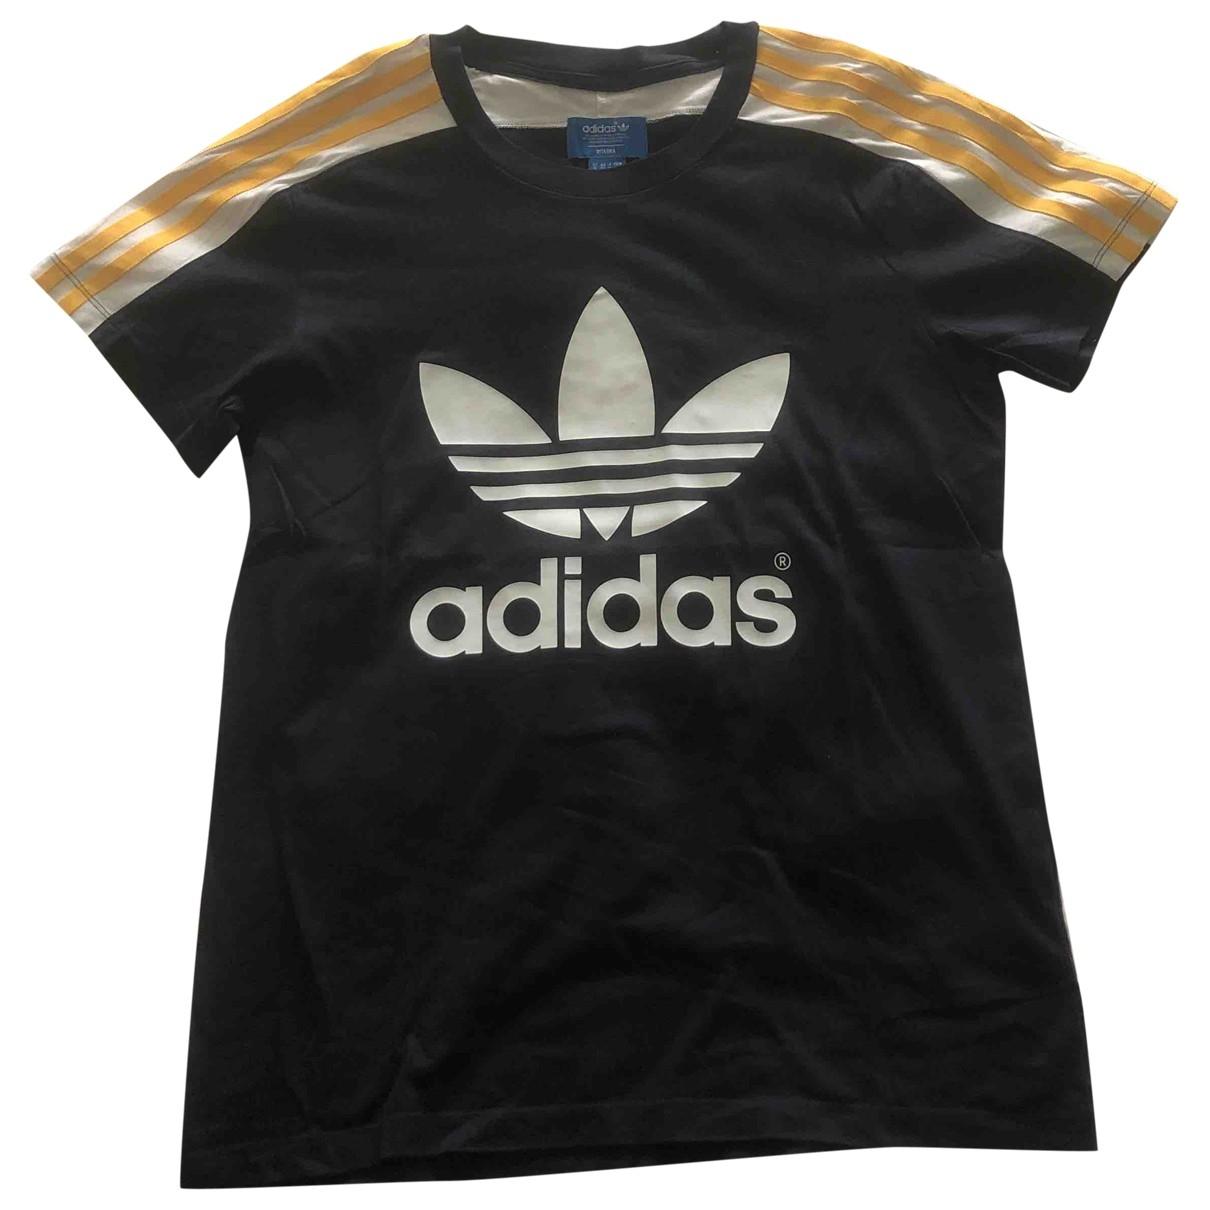 Adidas - Top   pour femme en coton - bleu